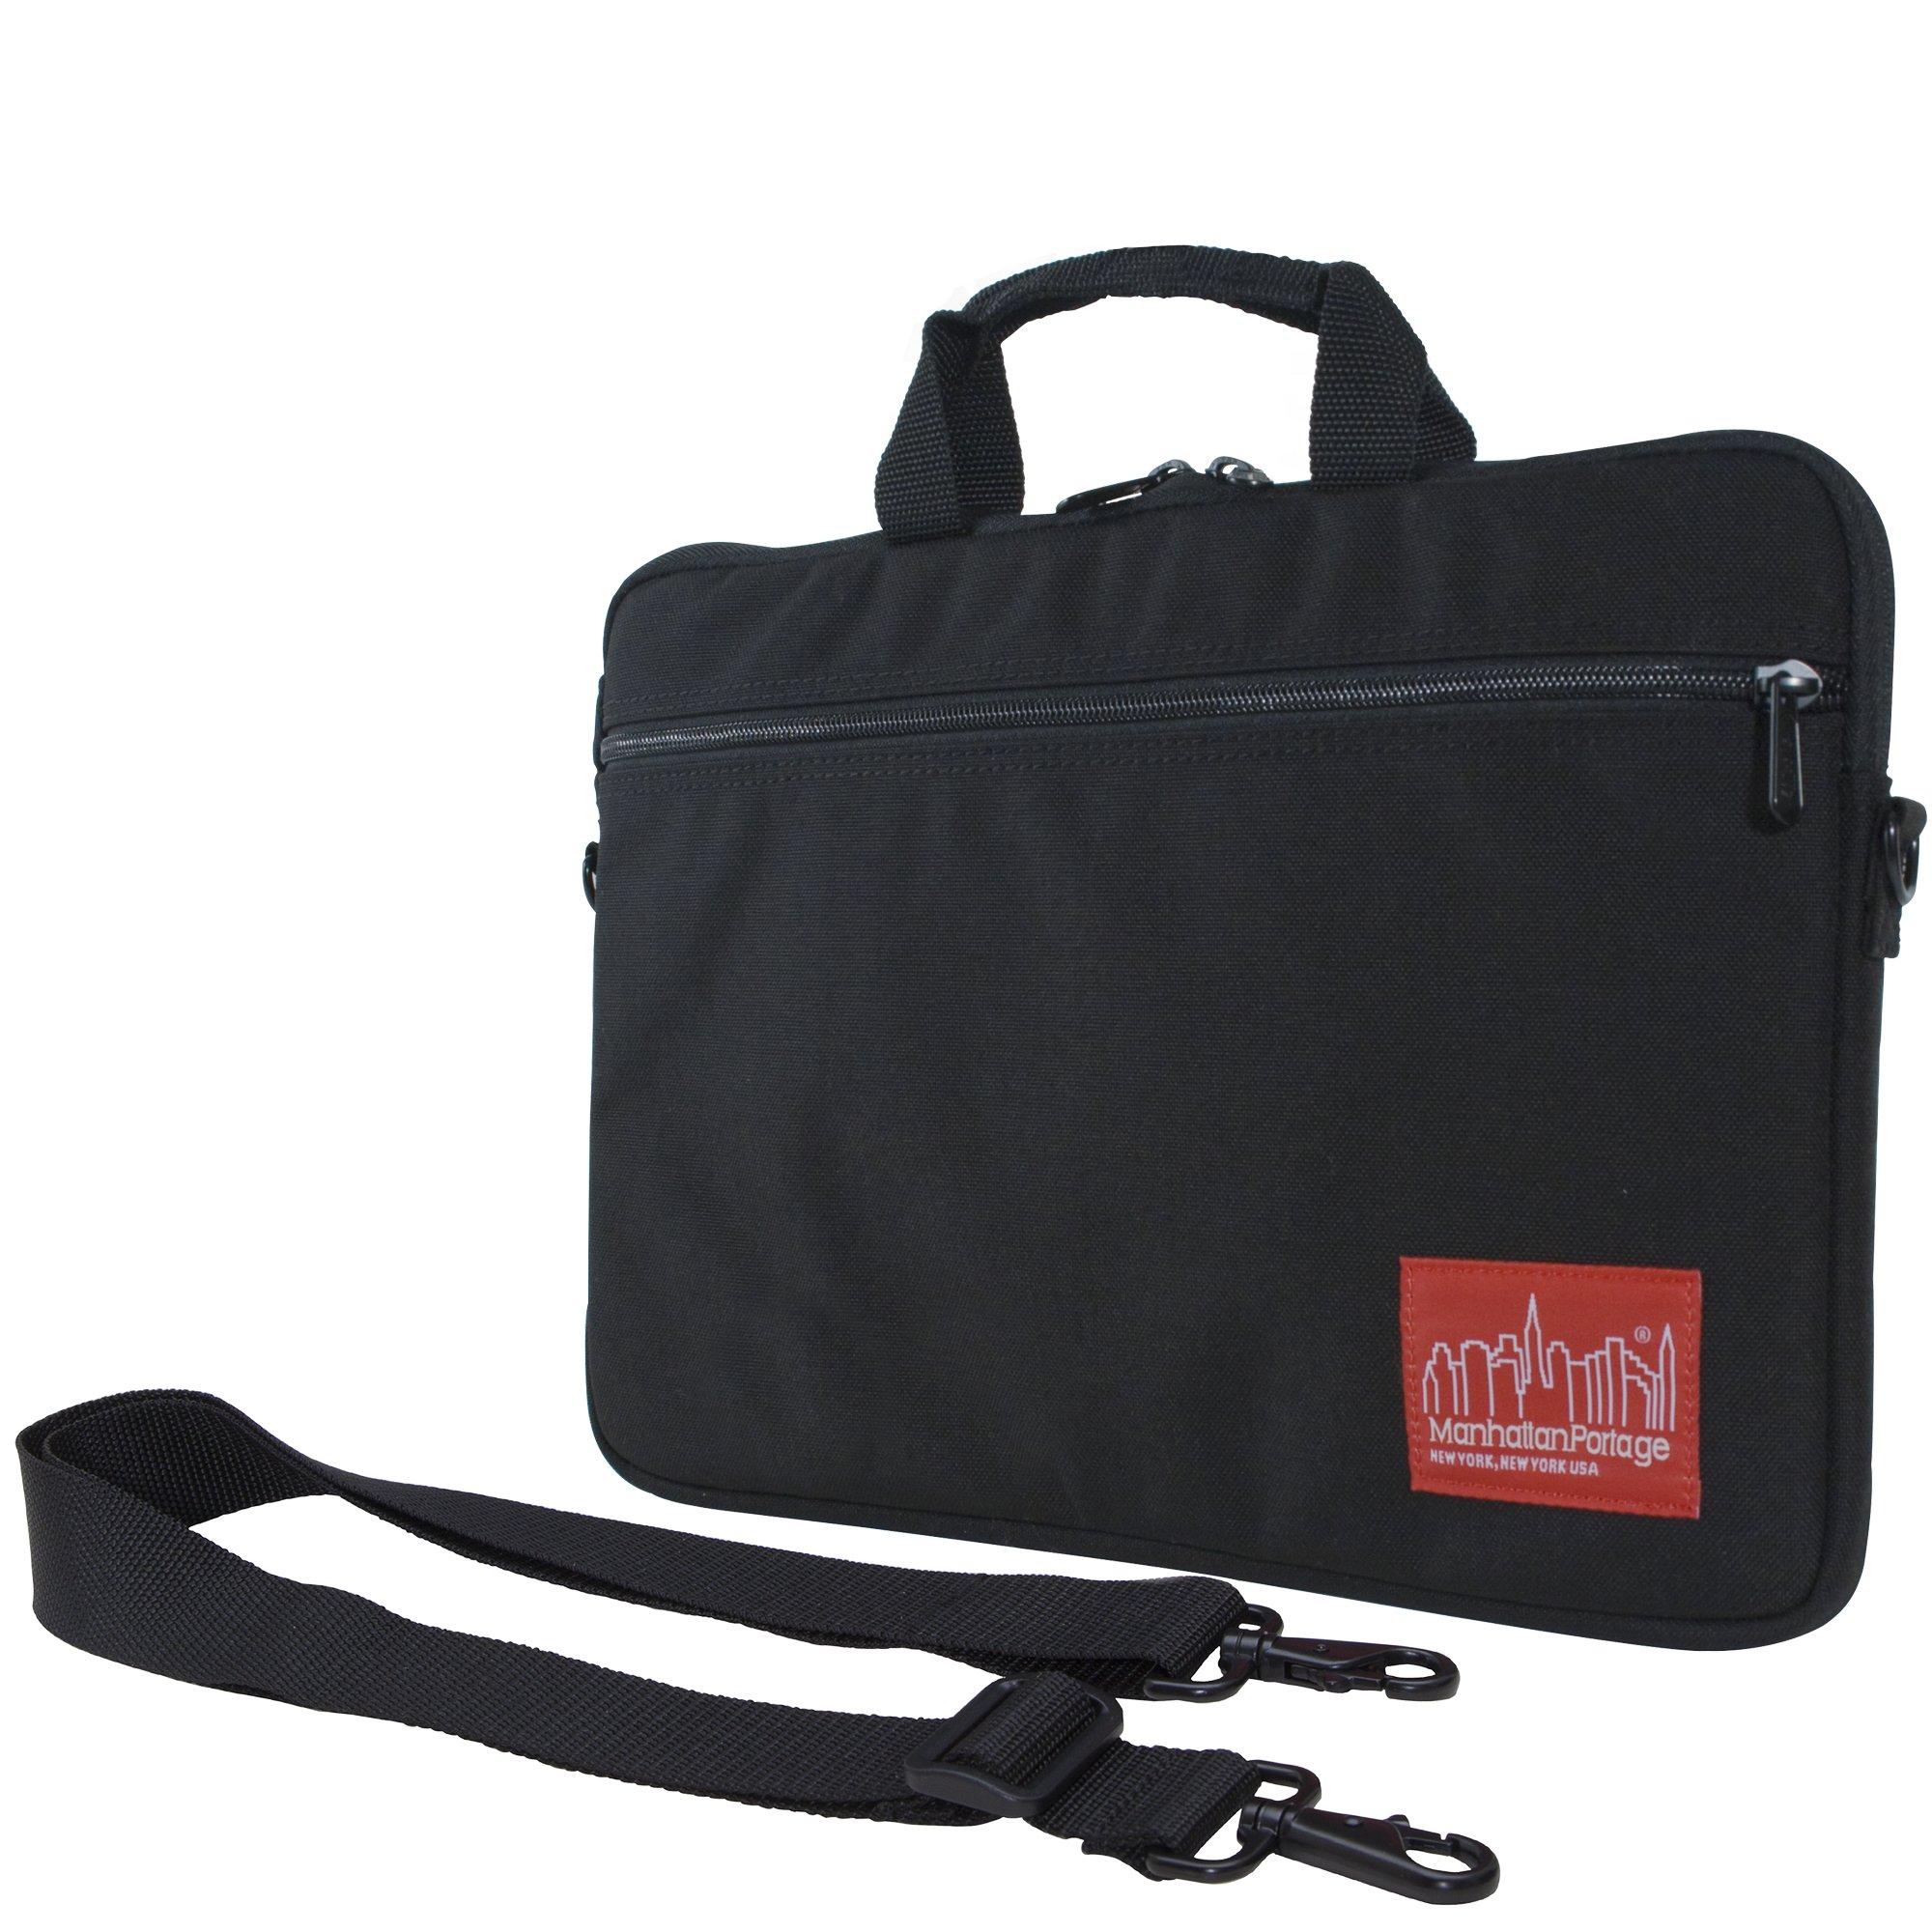 Manhattan Portage Convertible Laptop Bag (Black, Small)